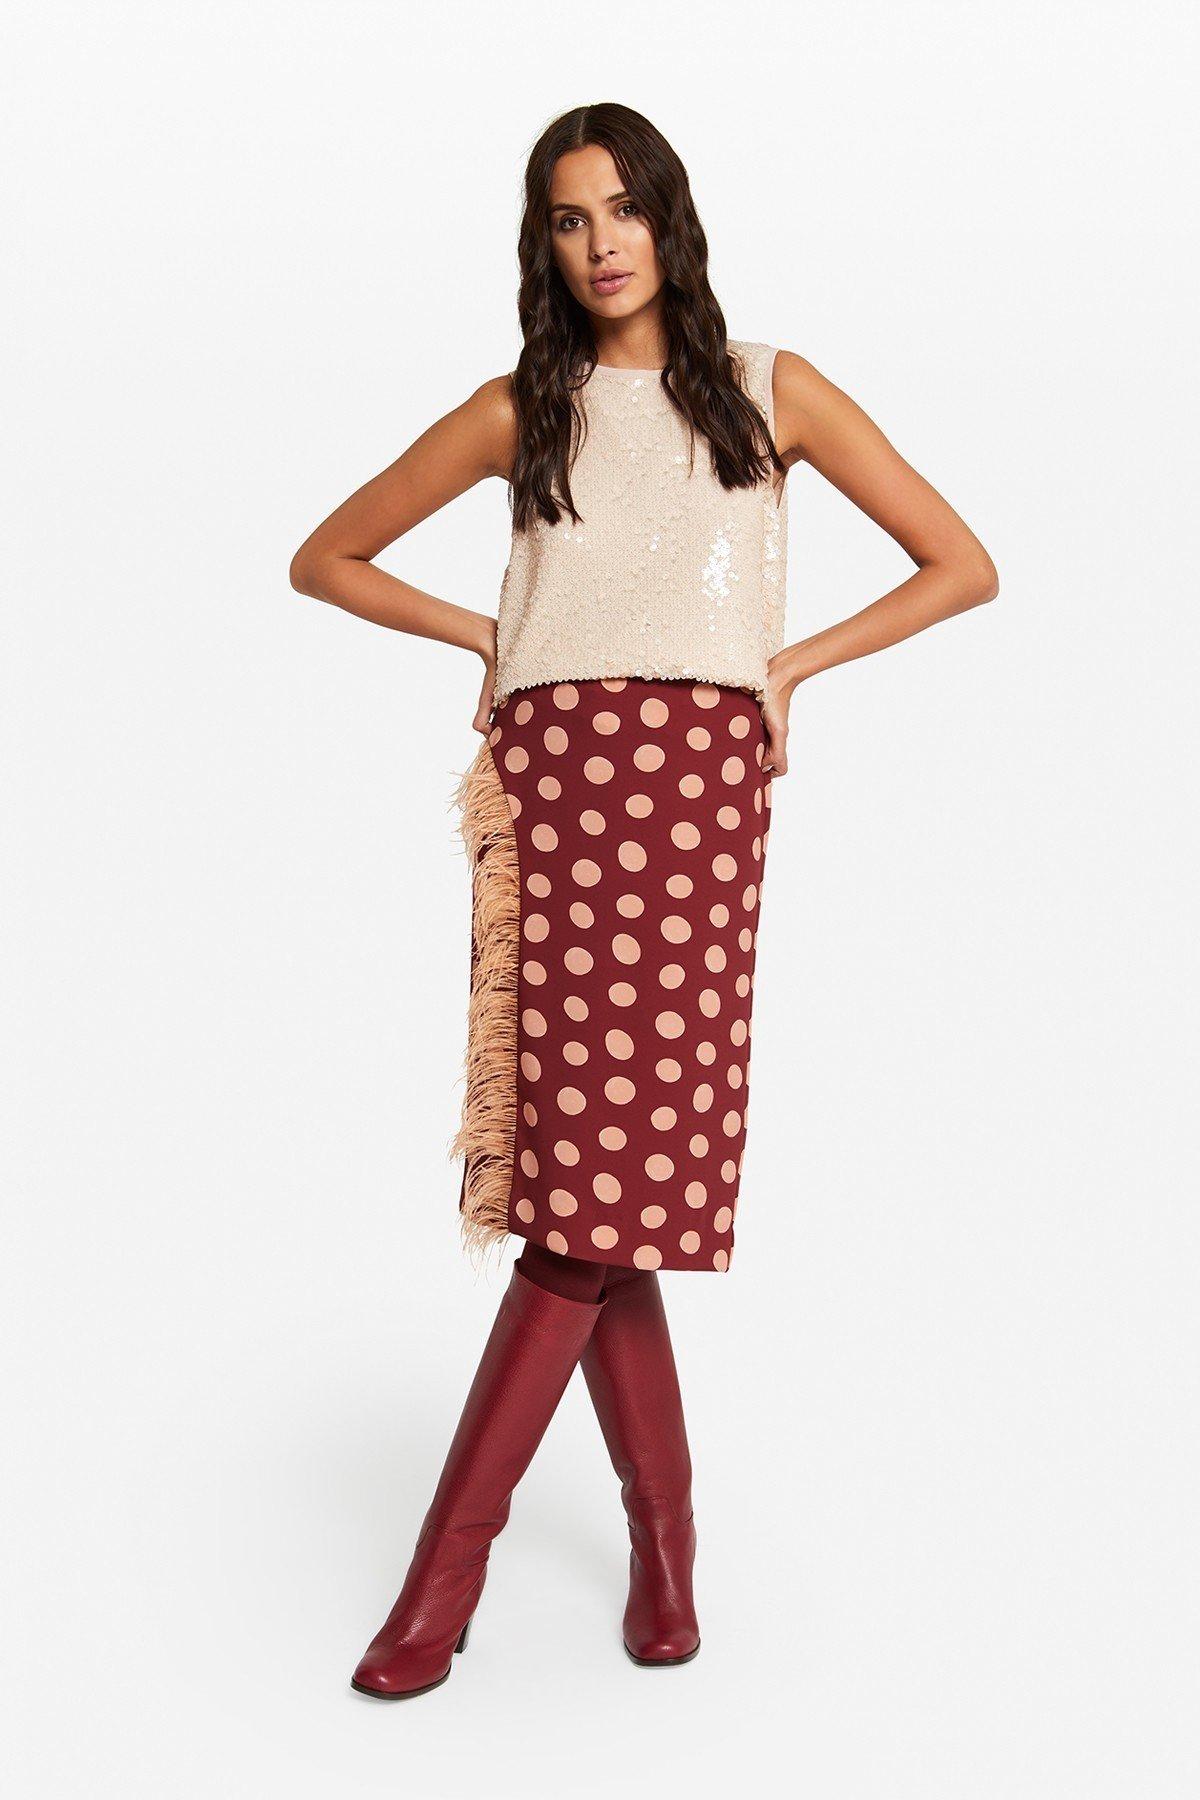 Longuette skirt with polka dots' print